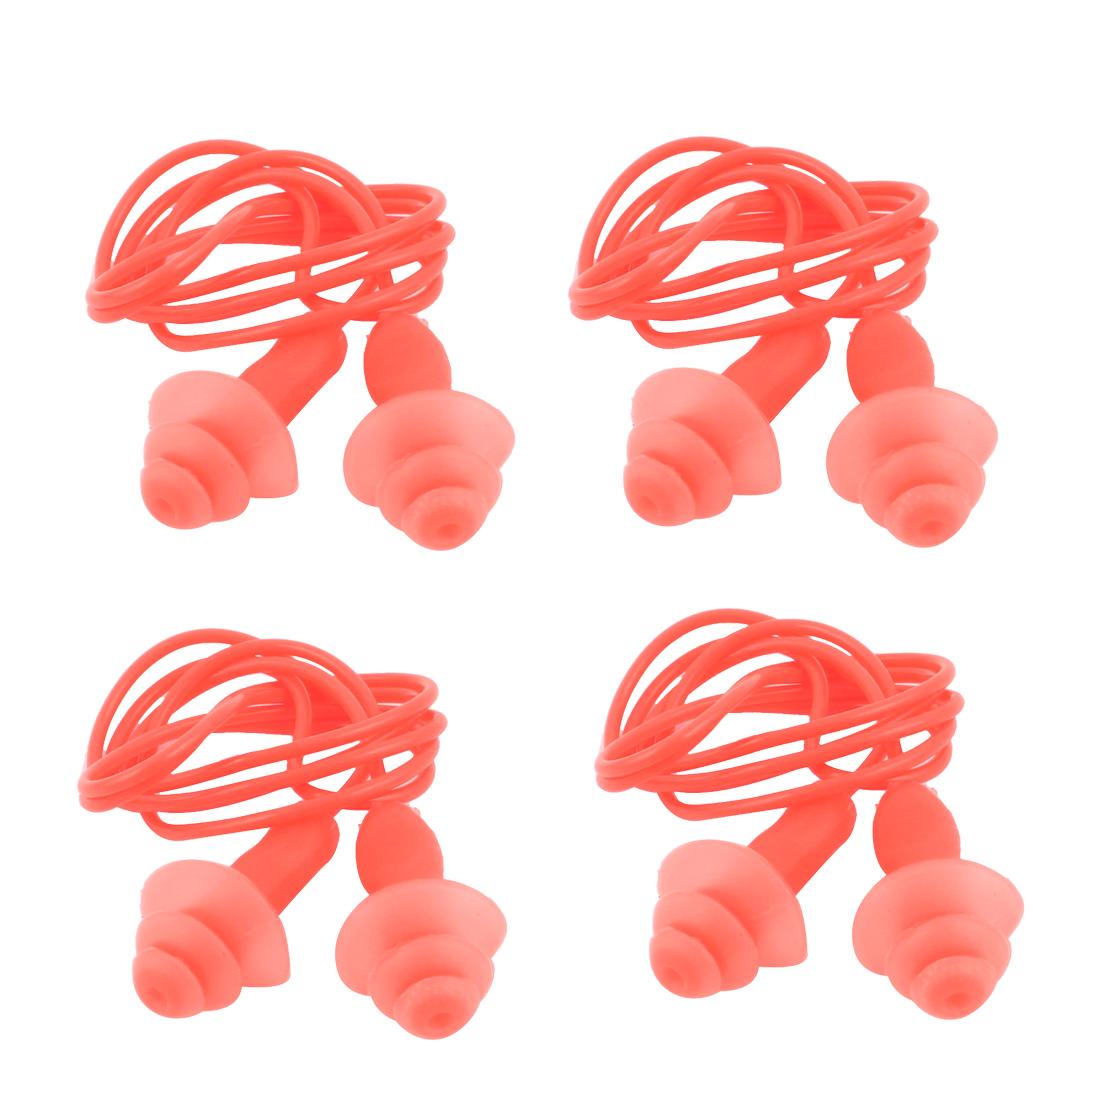 Swimming Orange Soft Silicone Wired Ear Plug Earplugs 4pcs